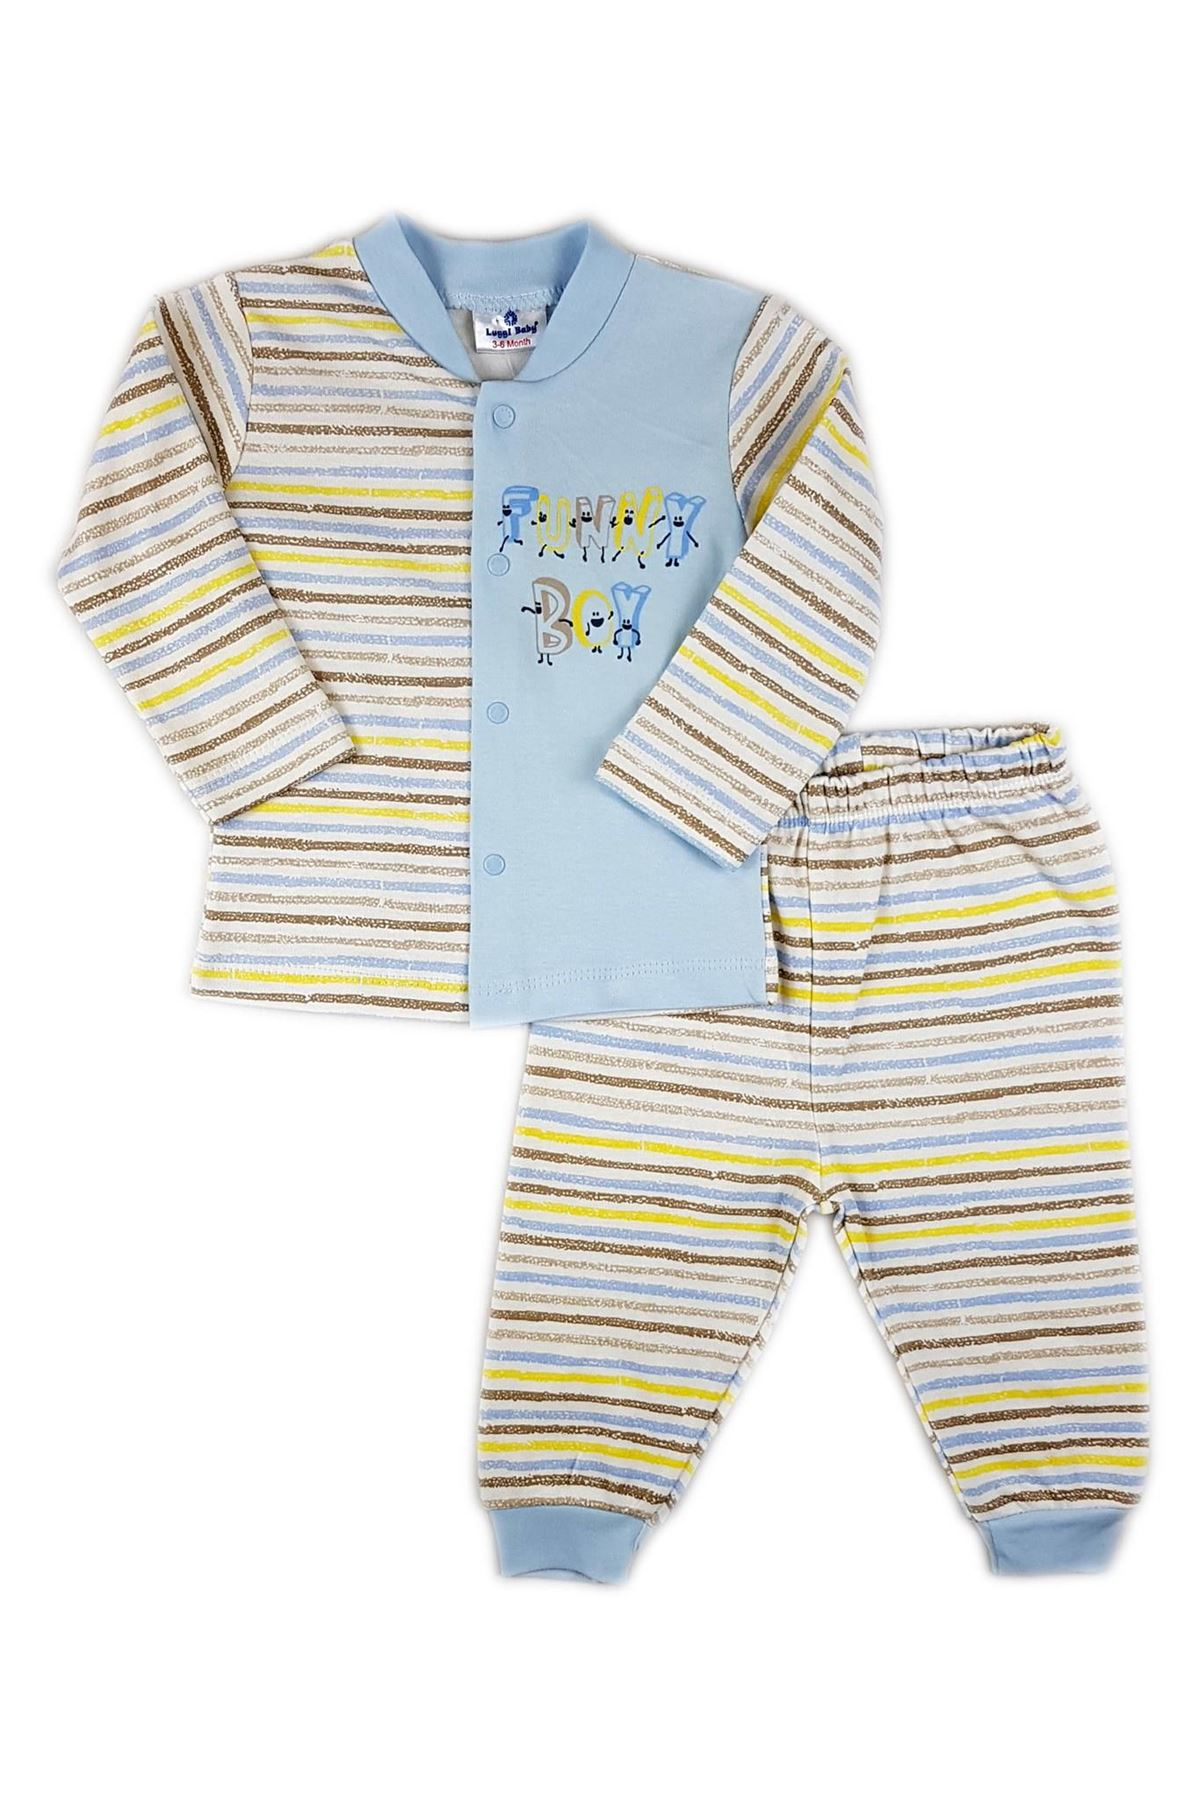 Luggi Baby Funny Bebek Pijama Takım LG-5420 Karışık Renkli